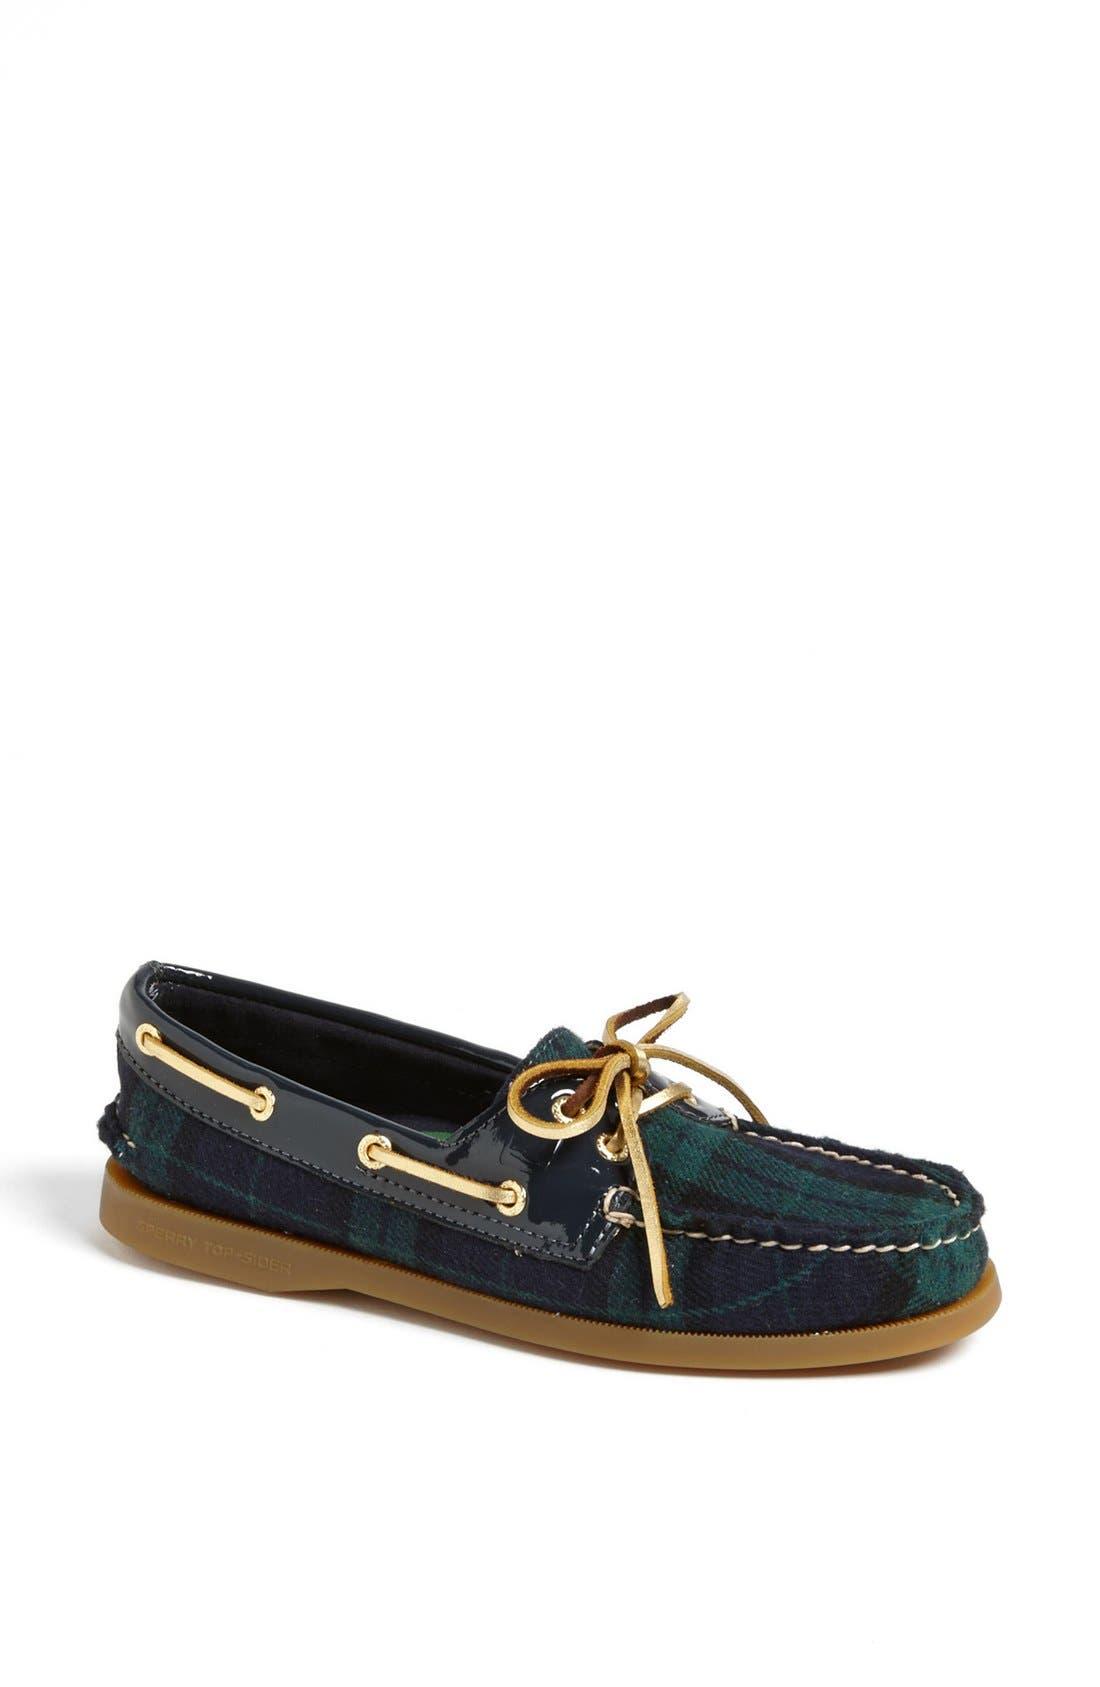 Main Image - Sperry 'Authentic Original' Boat Shoe